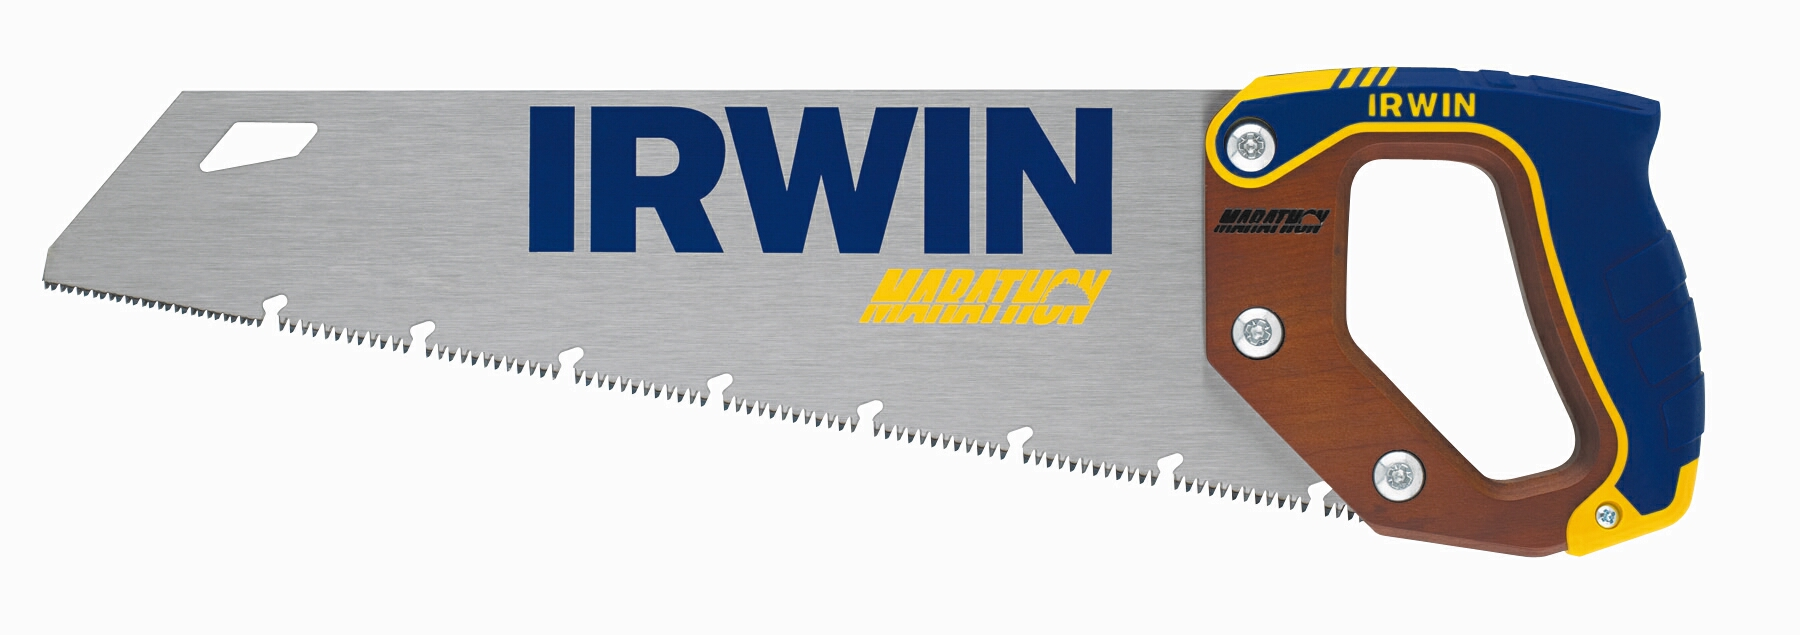 Irwin Tools Logo PNG - 113357